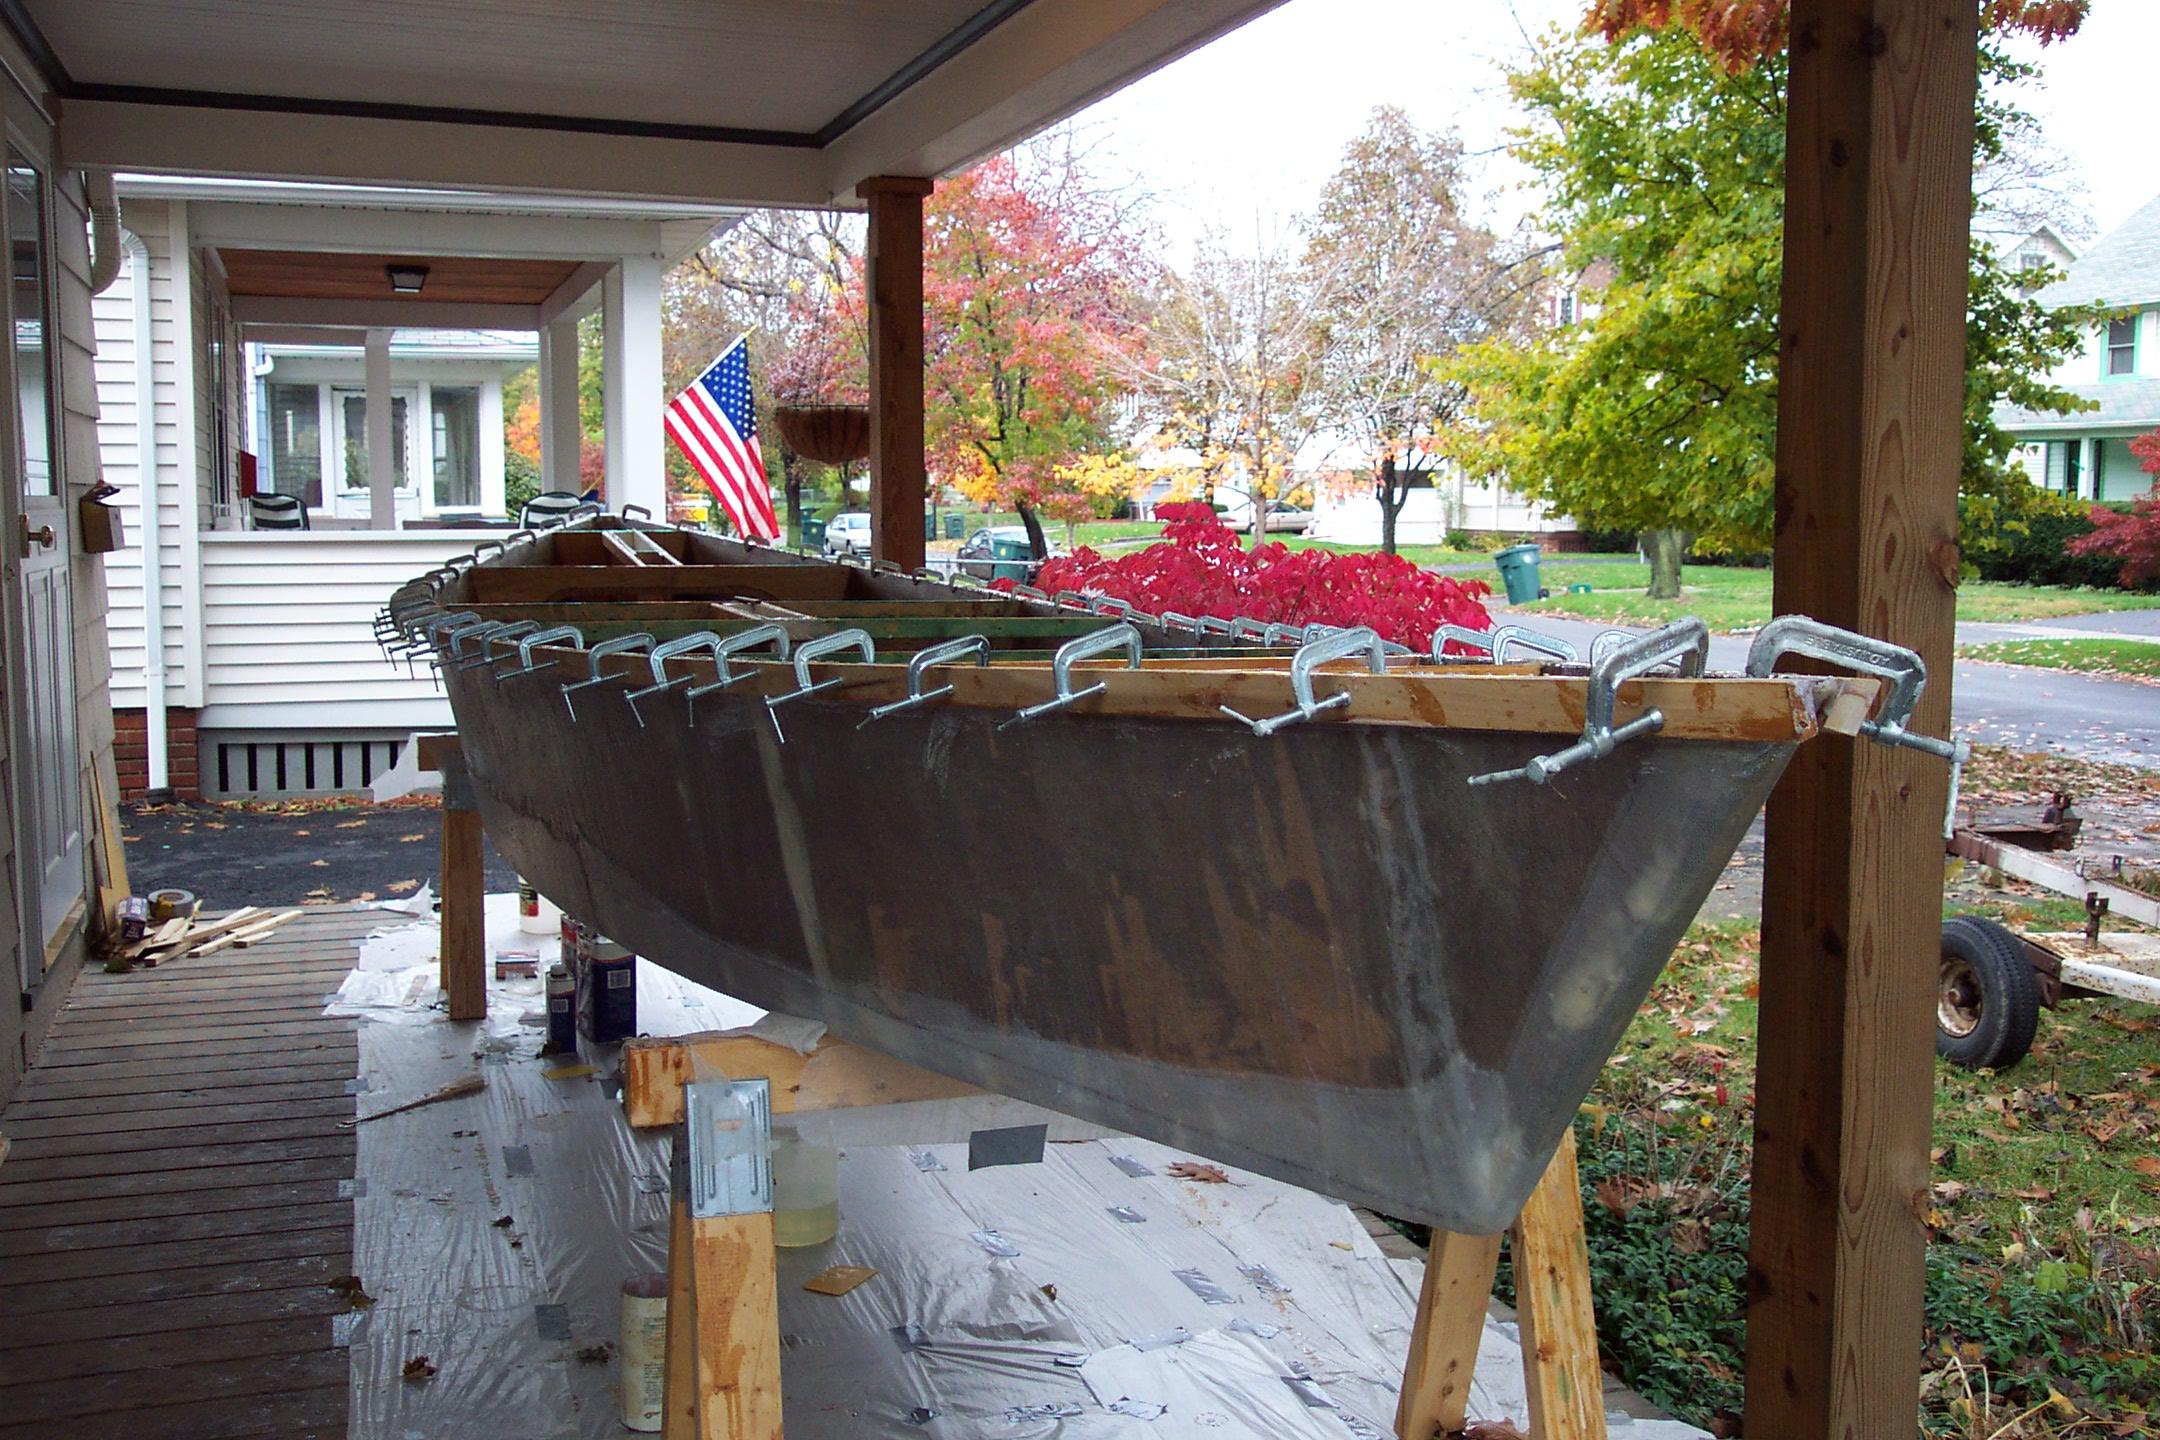 filesheet plywood boat under constructionjpg wikimedia